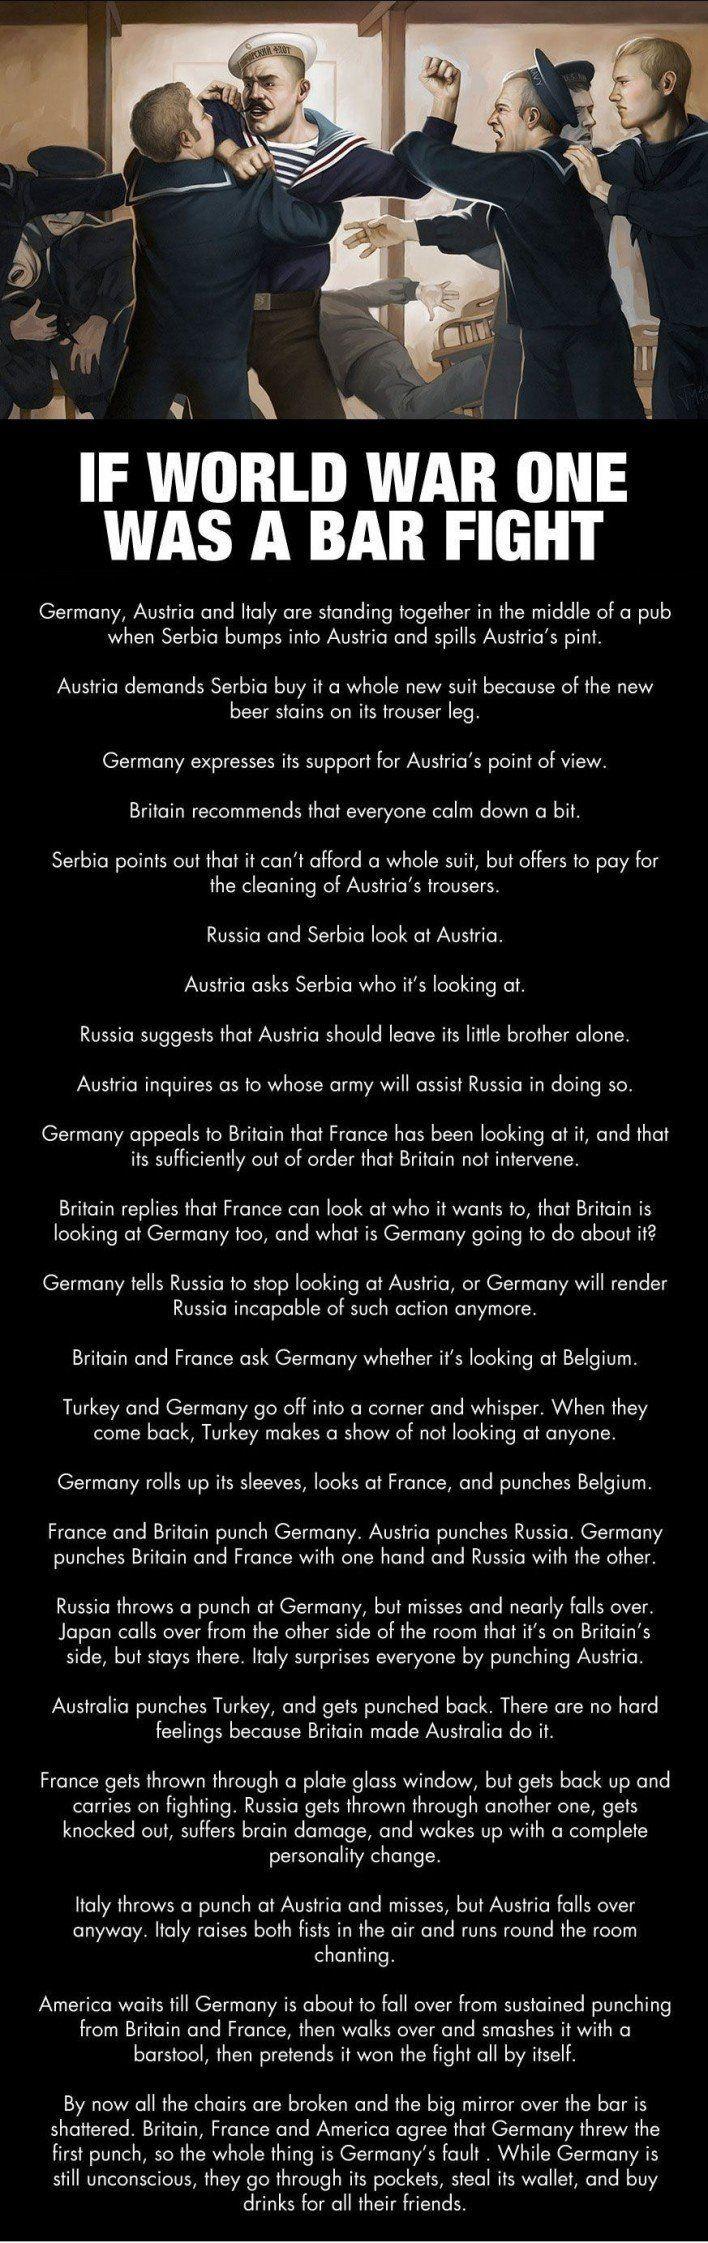 essay questions about world war 2